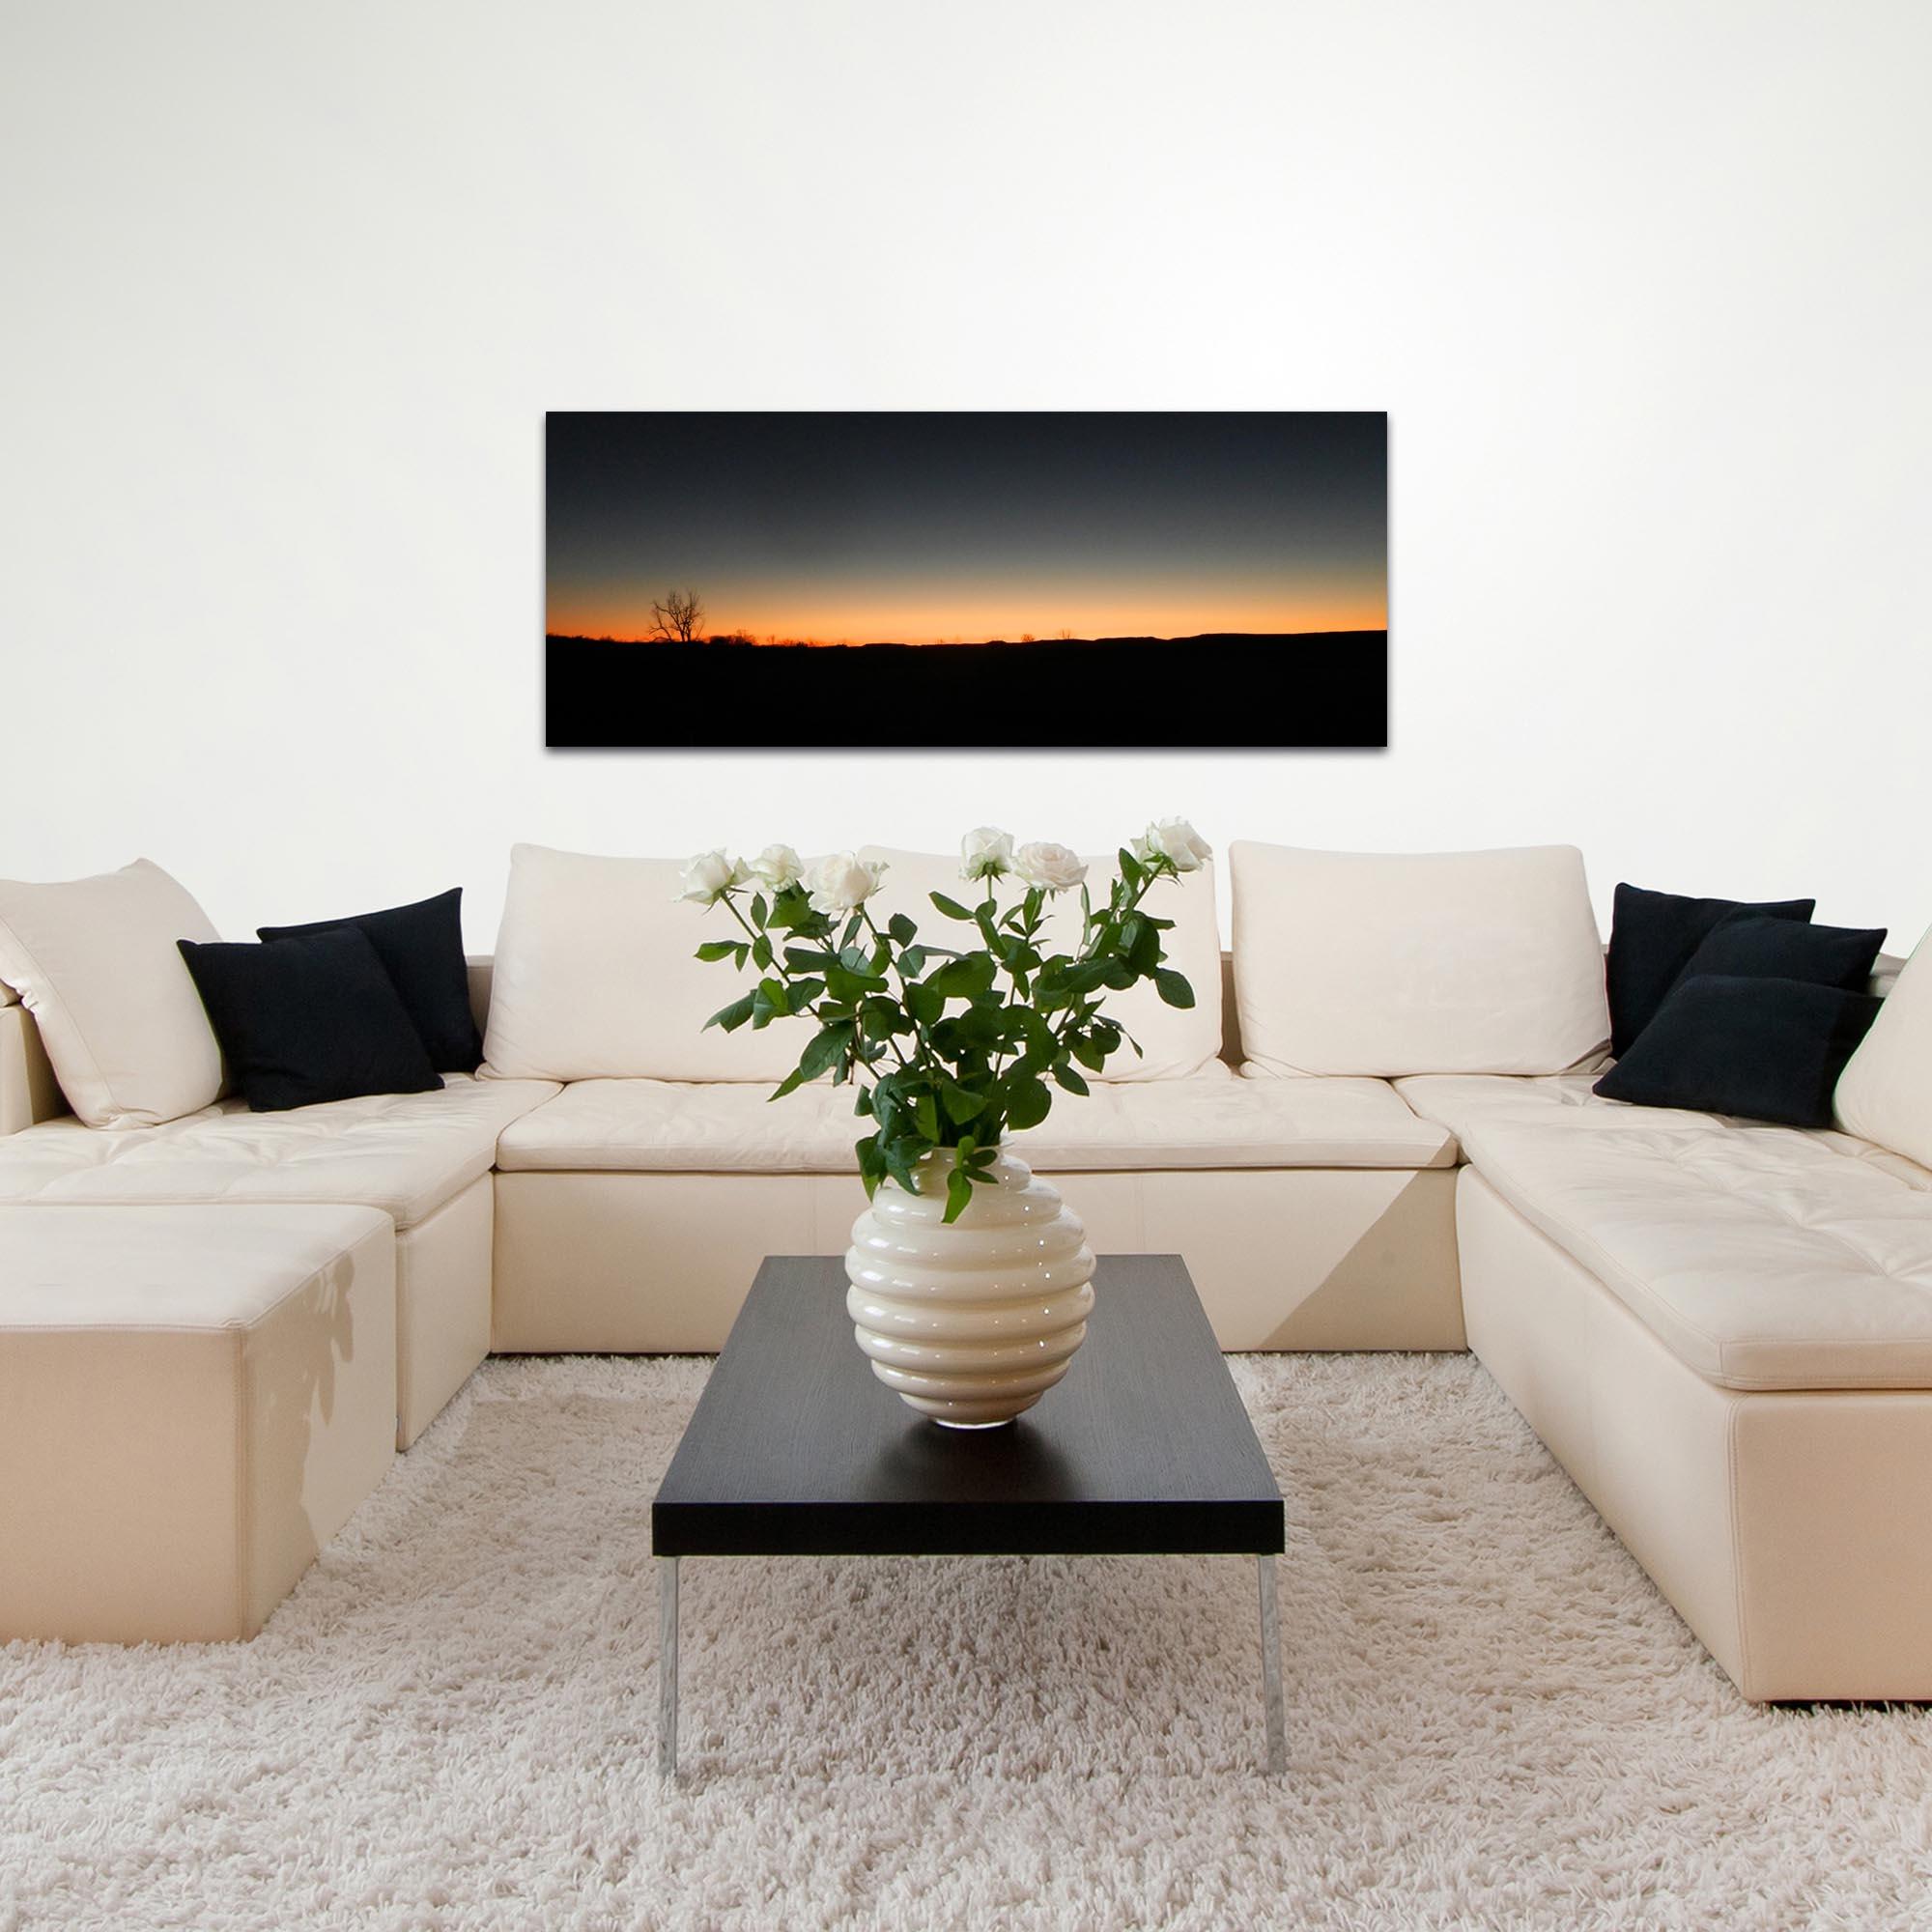 Western Wall Art 'Desert Sunset' - American West Decor on Metal or Plexiglass - Lifestyle View